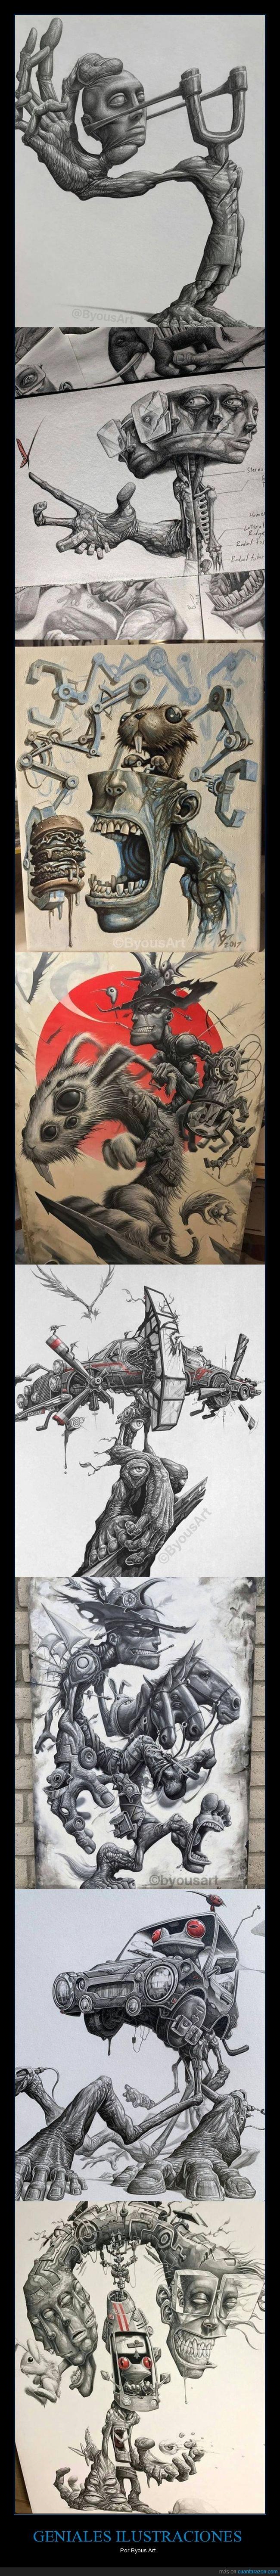 byous art,ilustraciones